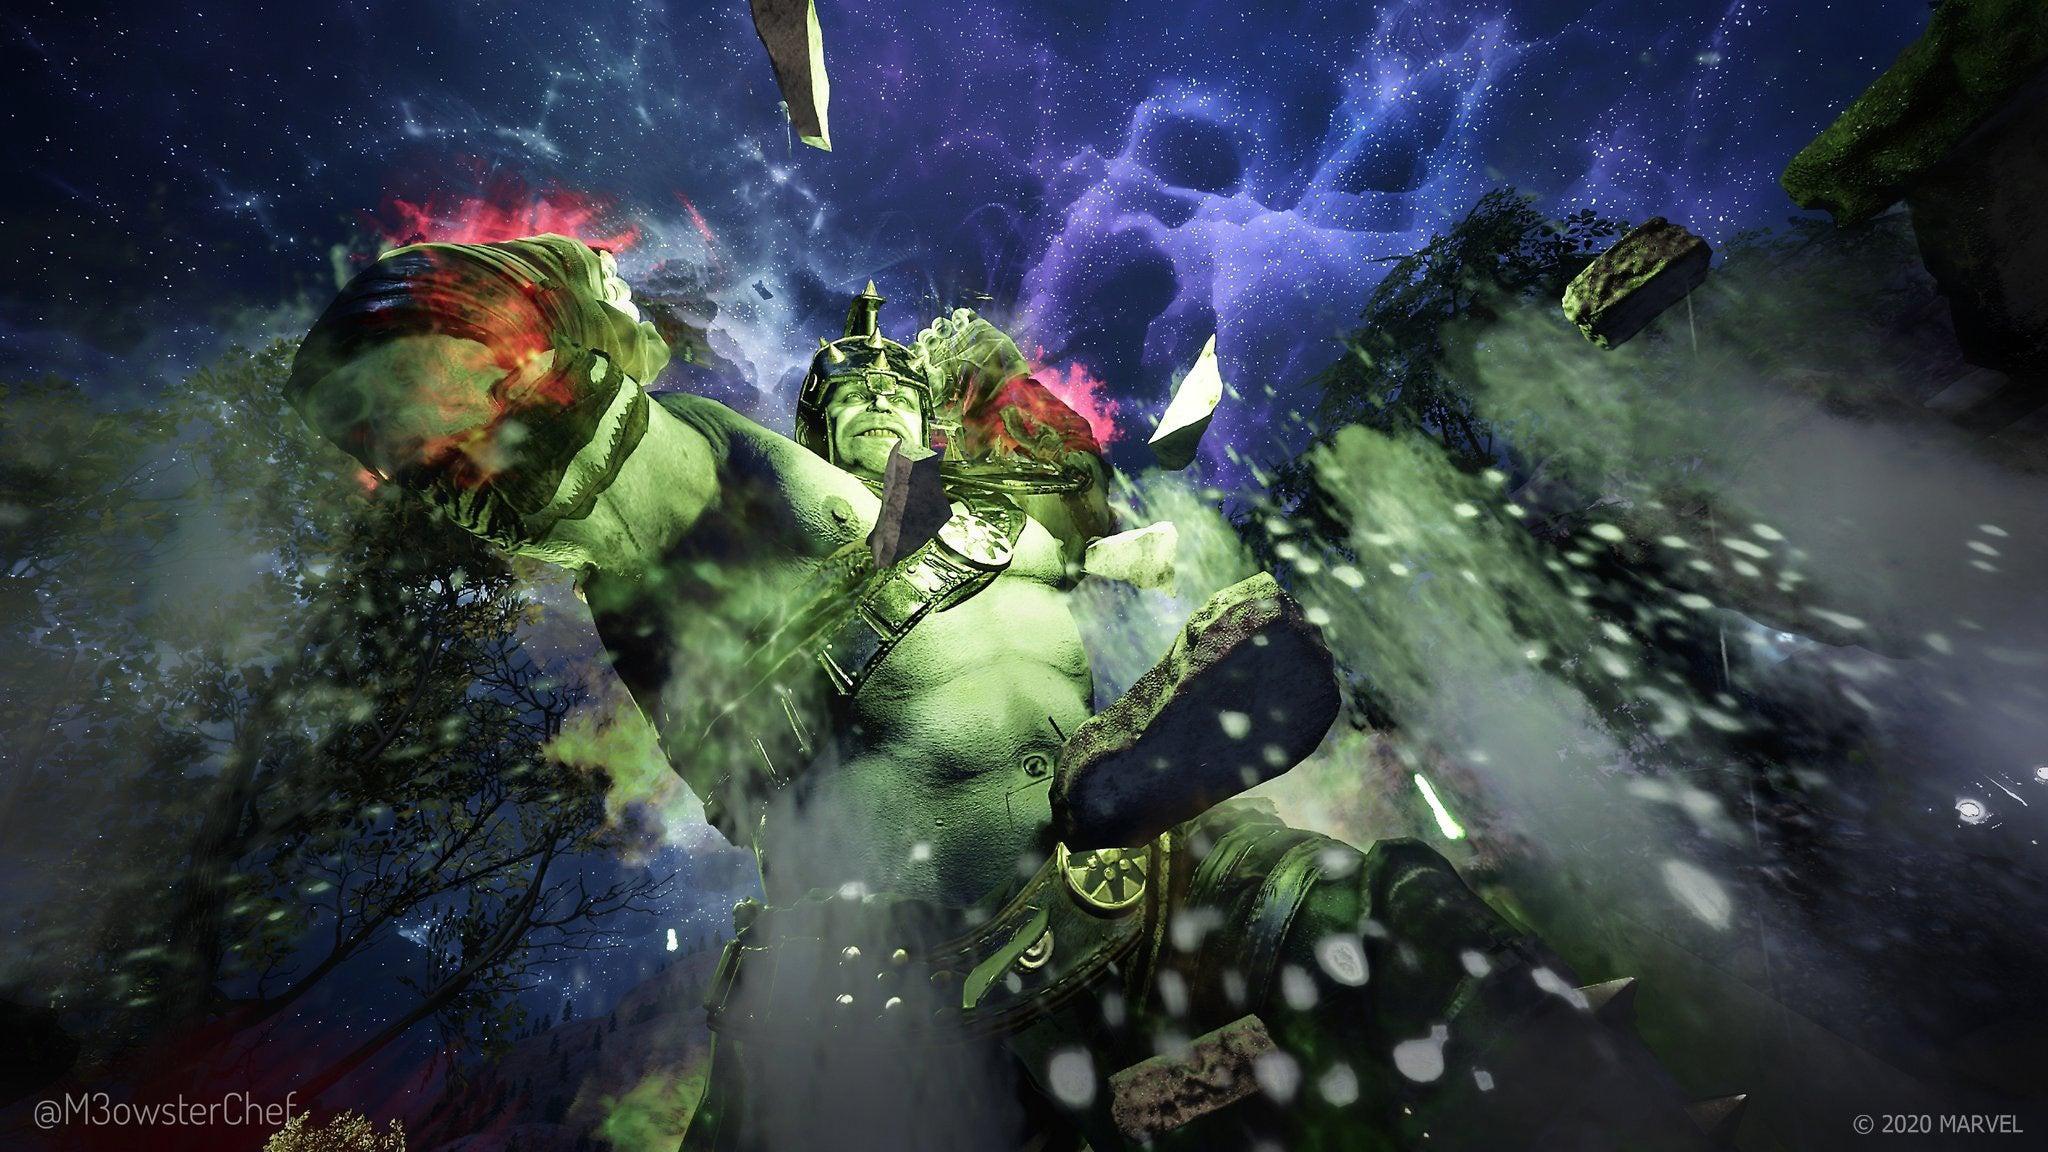 Fan Art of Hulk smashing the ground